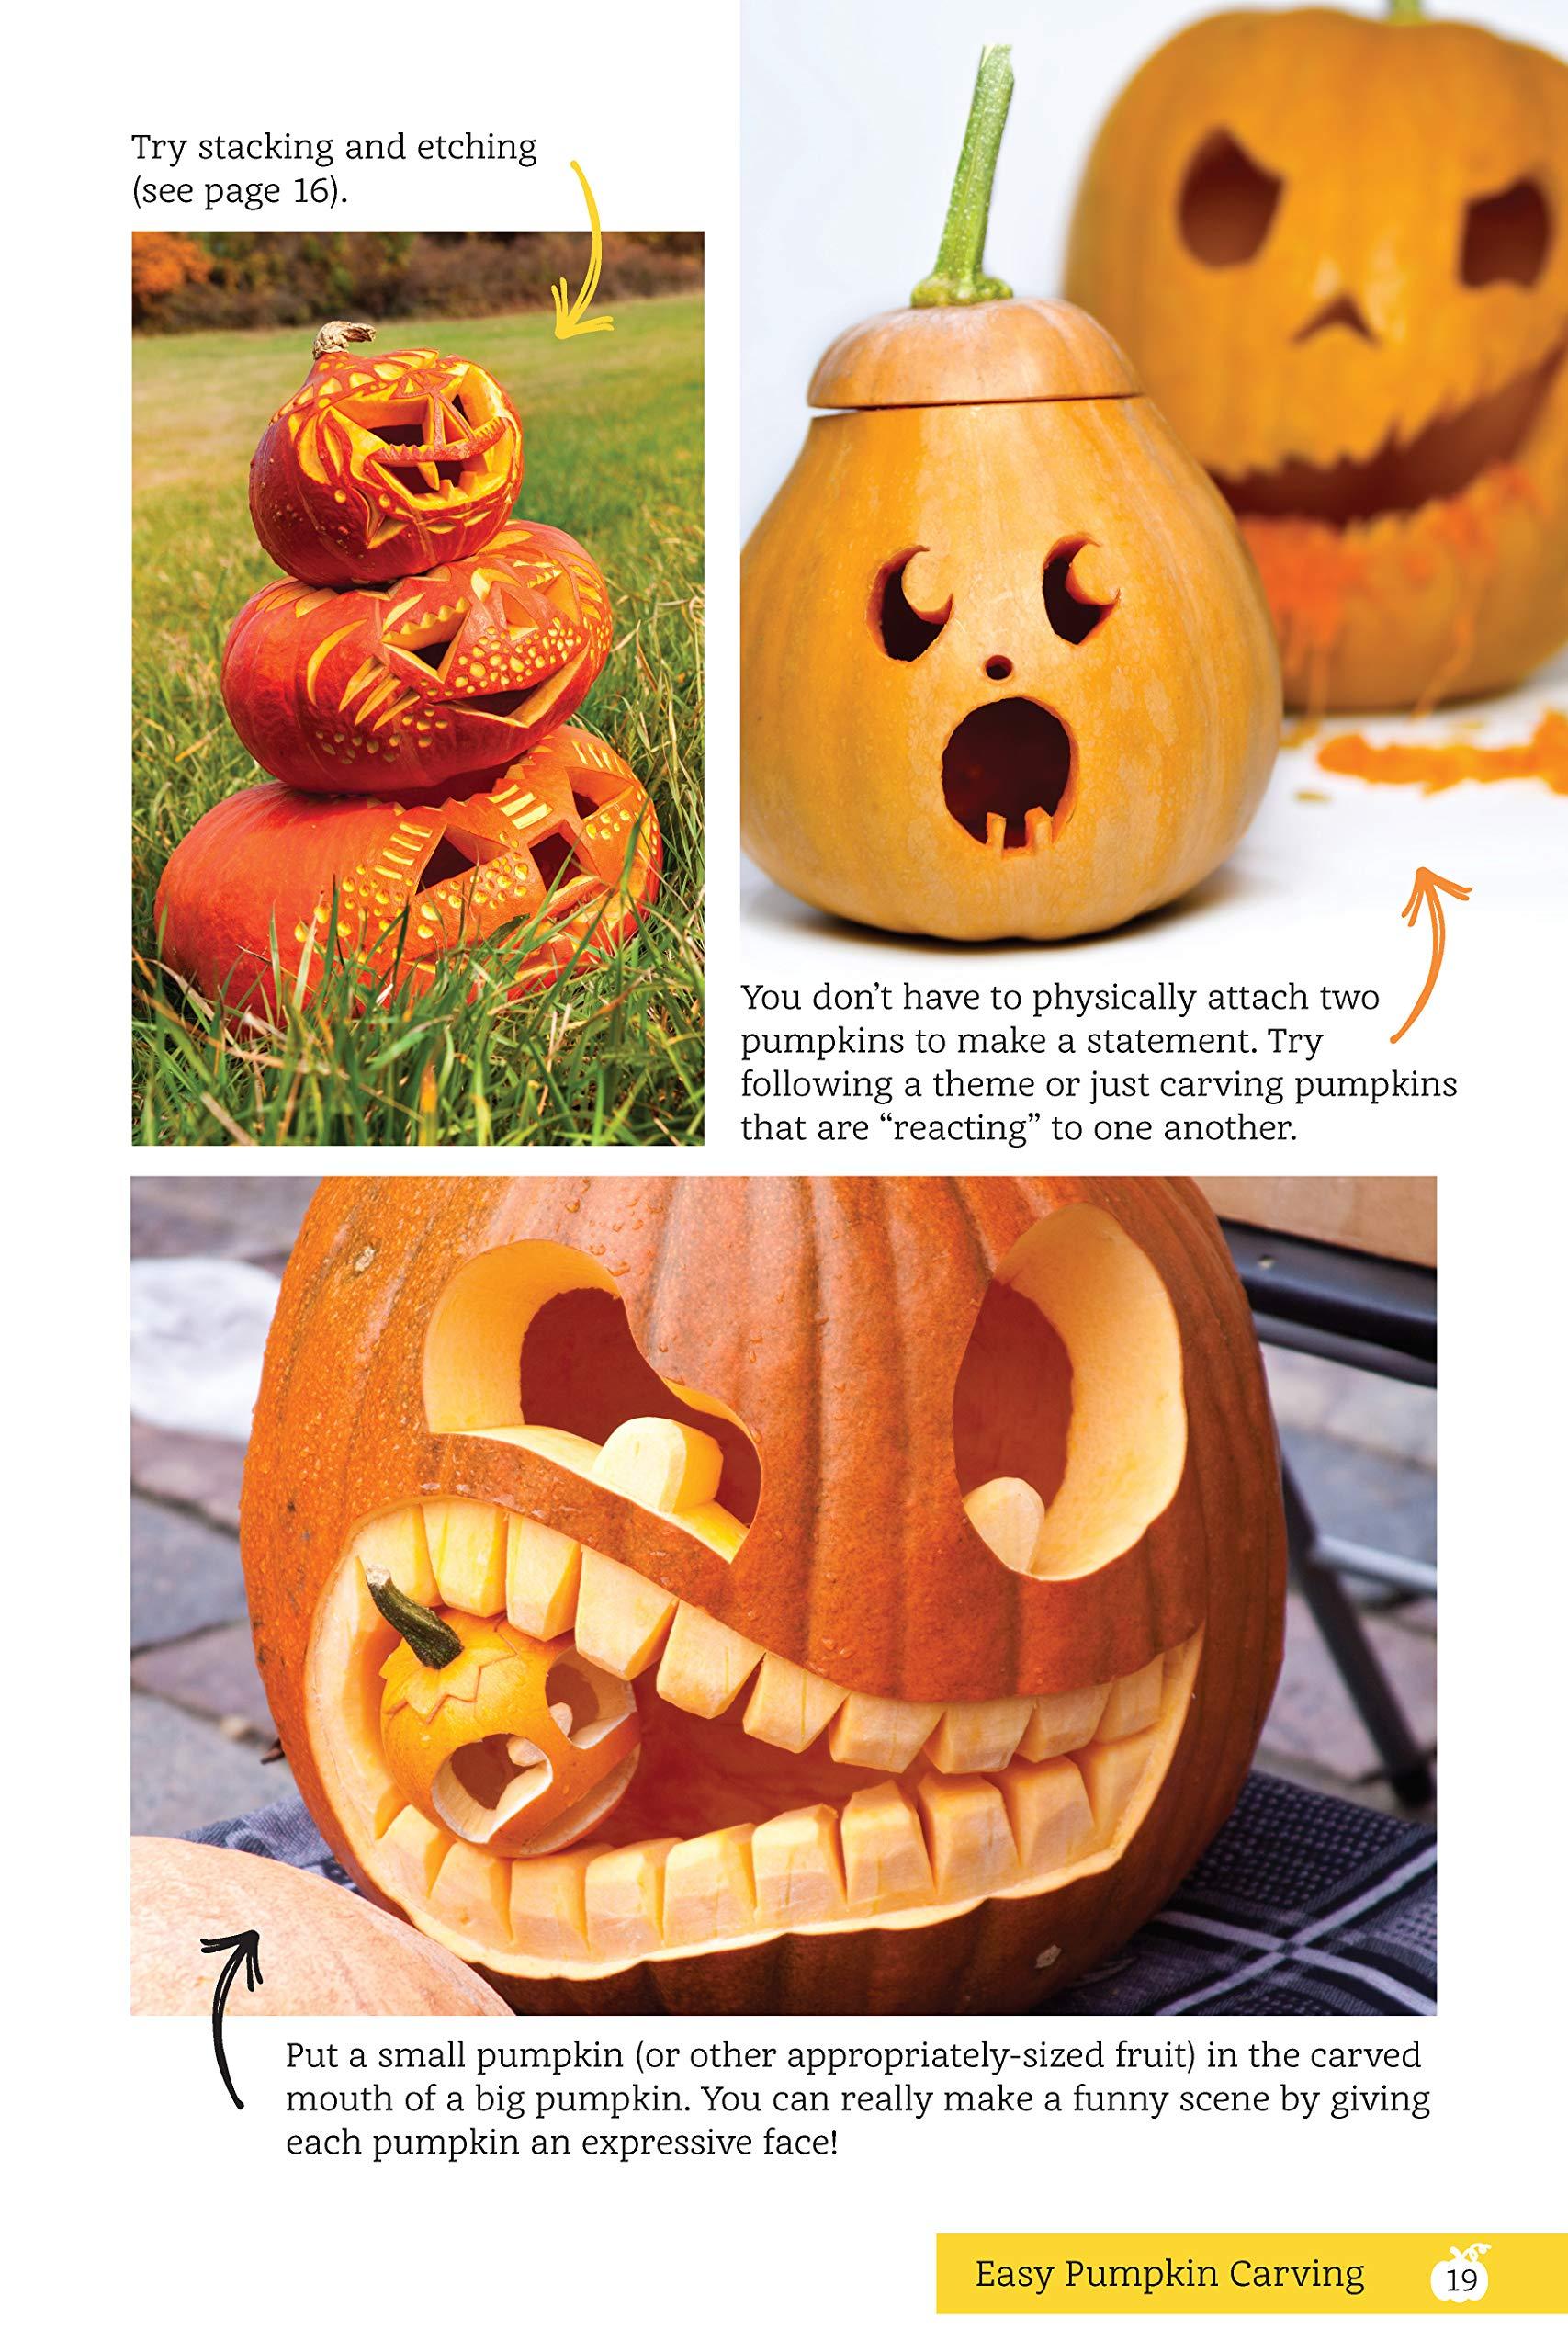 Easy pumpkin carving spooktacular patterns tips ideas fox